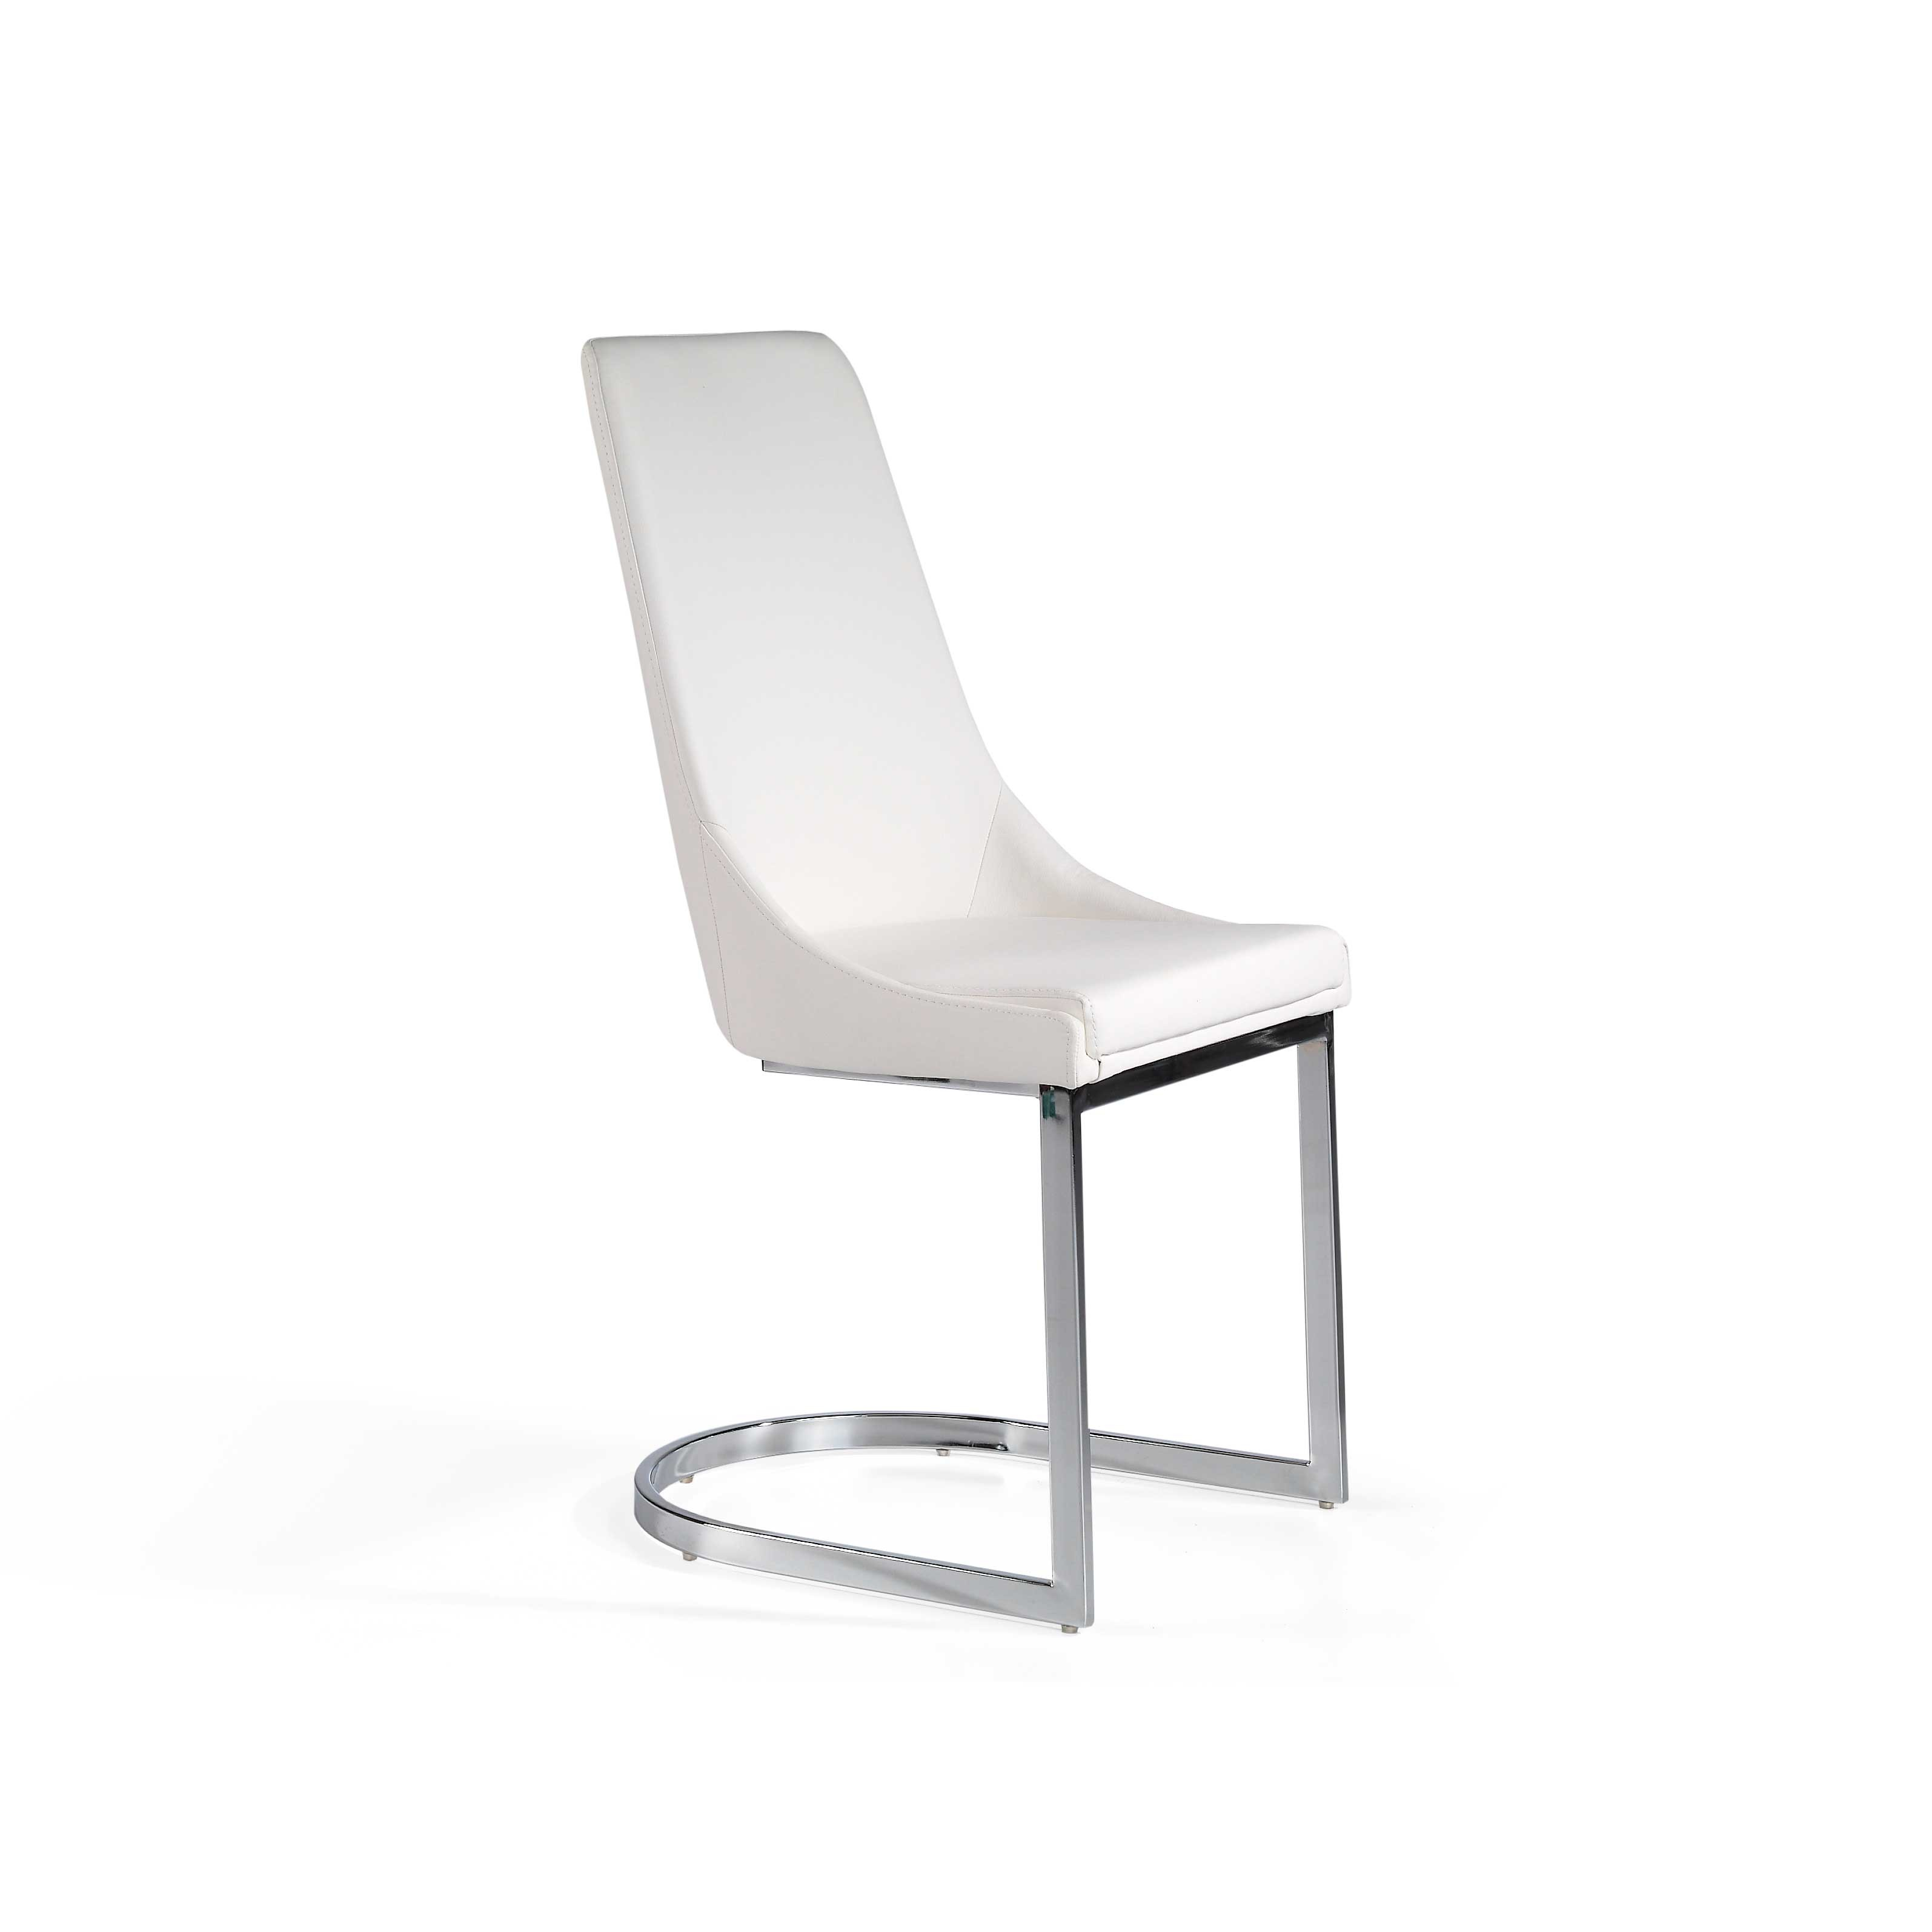 Pack 2 sillas tapizada blanca